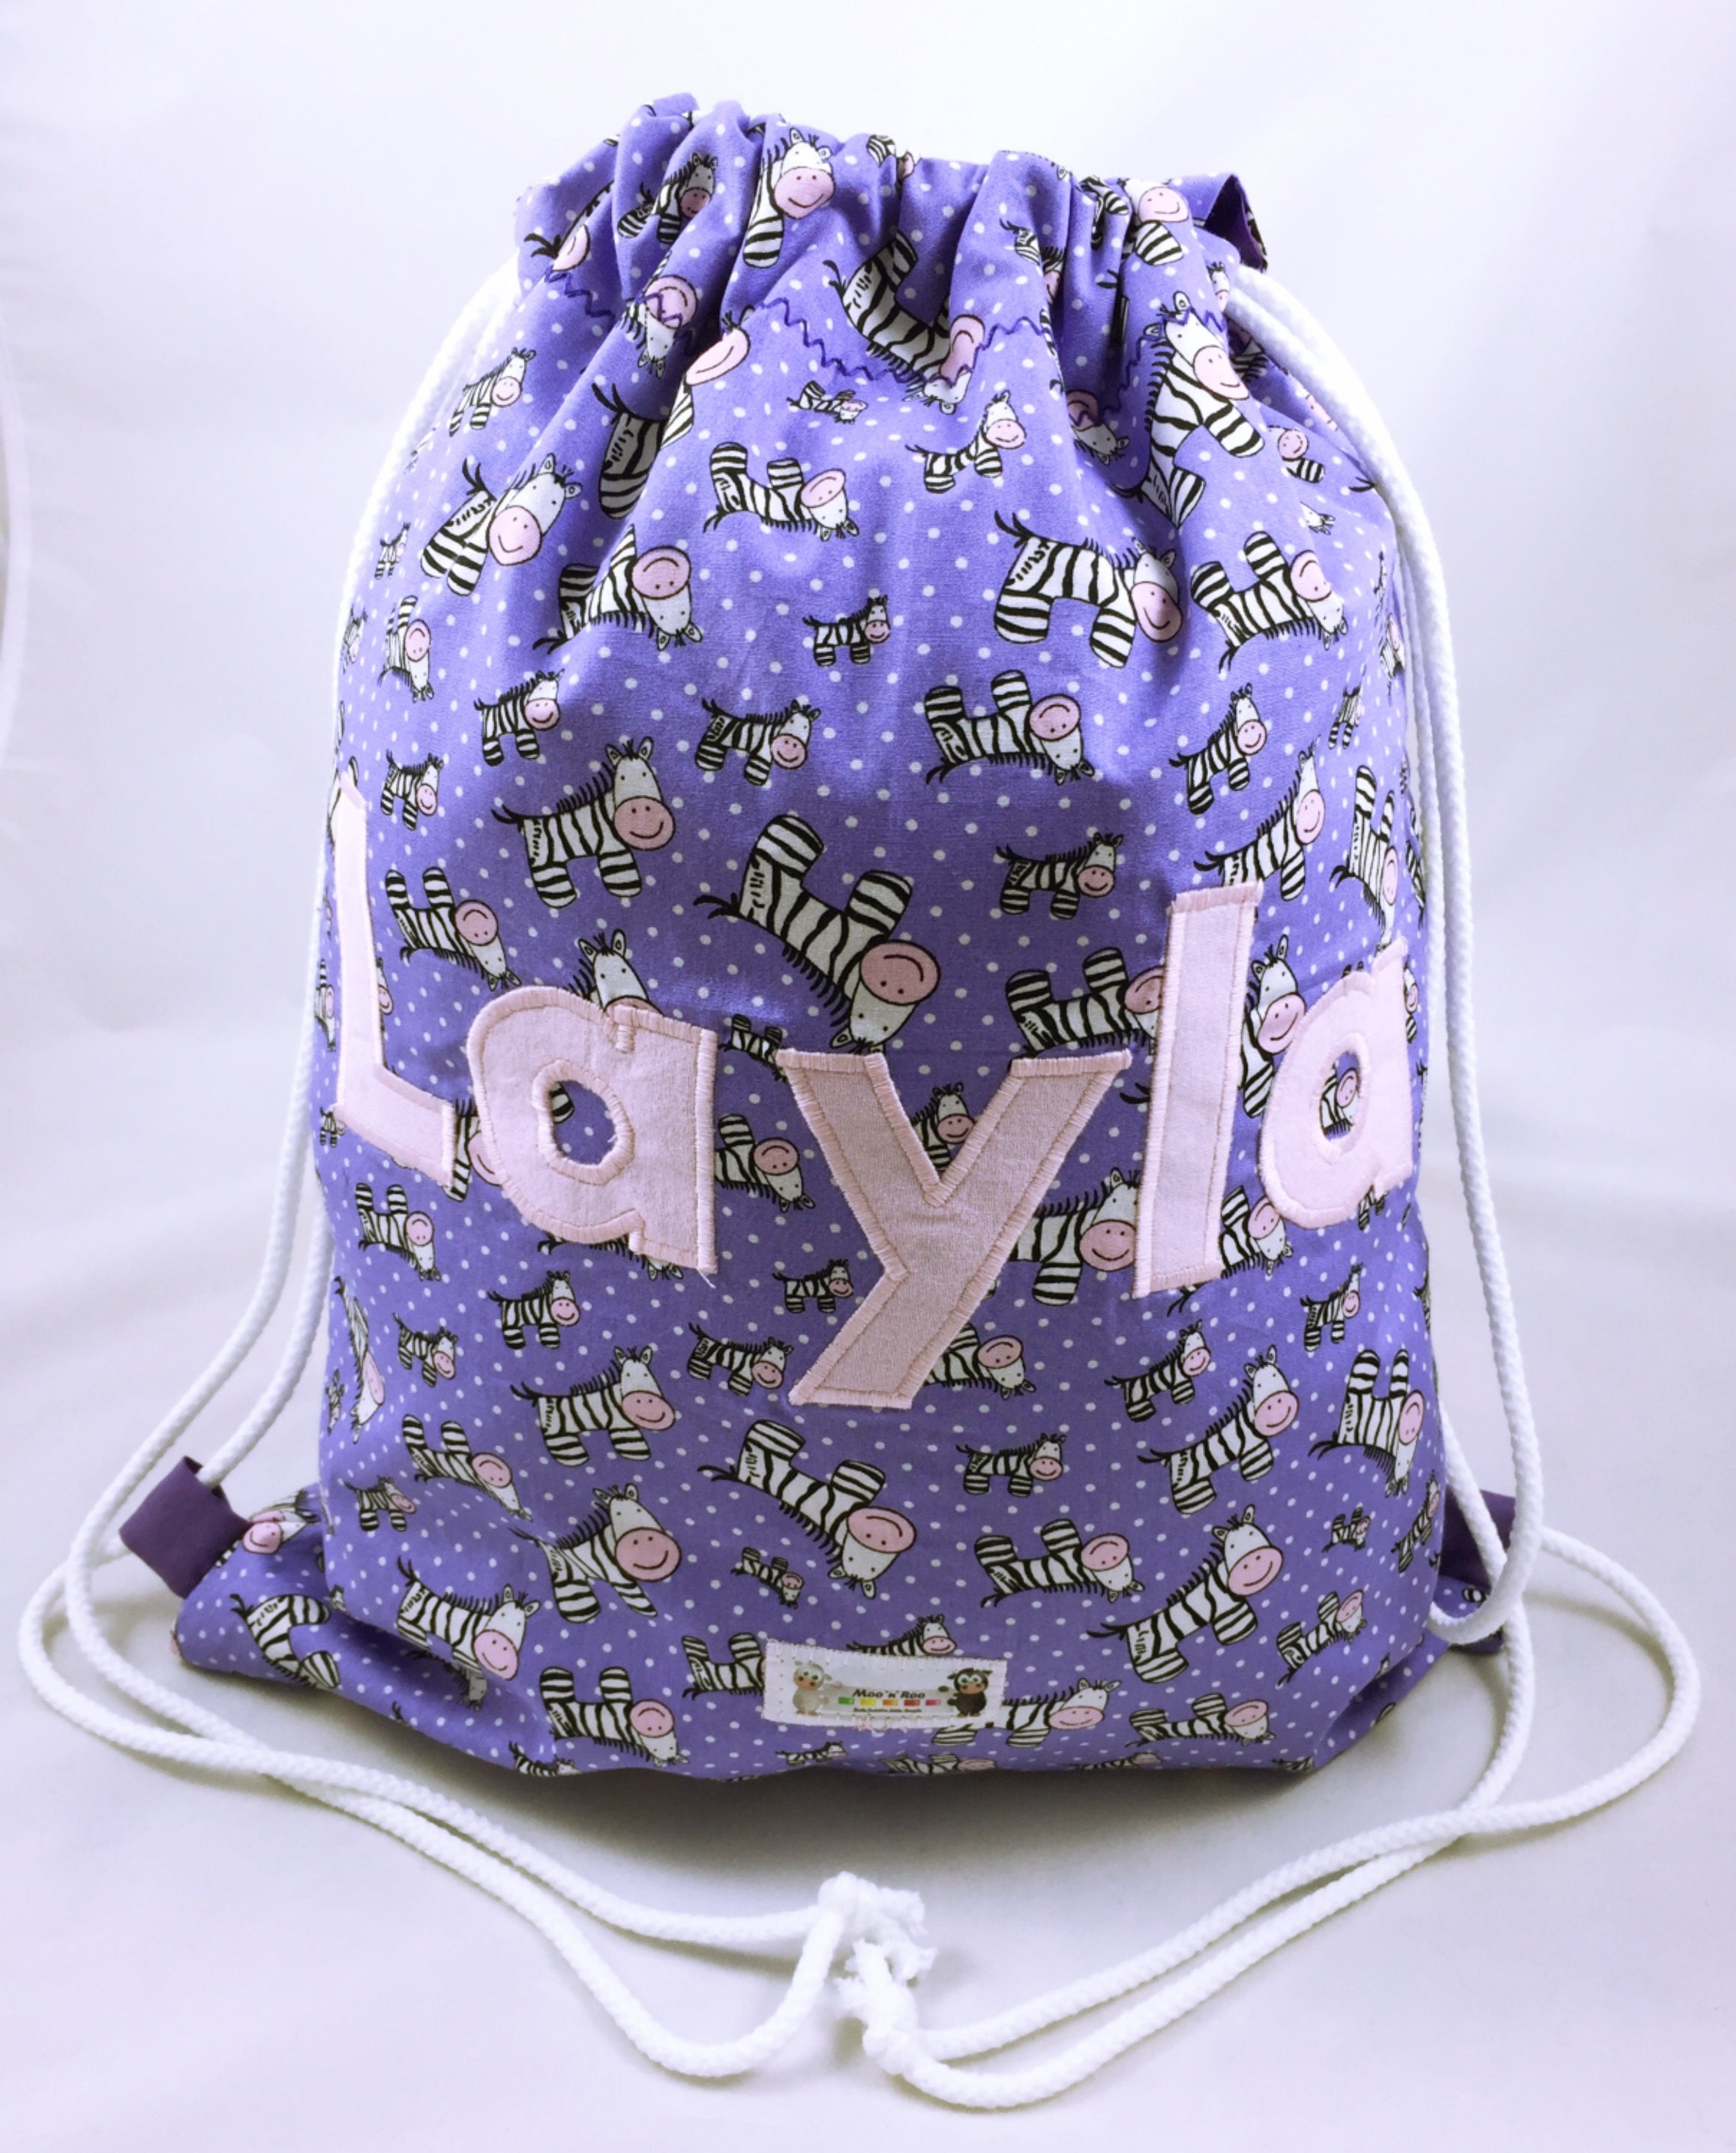 Girls Personalised PE Bag Overnight Bag School bag Drawstring bag Nursery bag Overnight bag Purple Zebras Swim Bag Backpack Bag